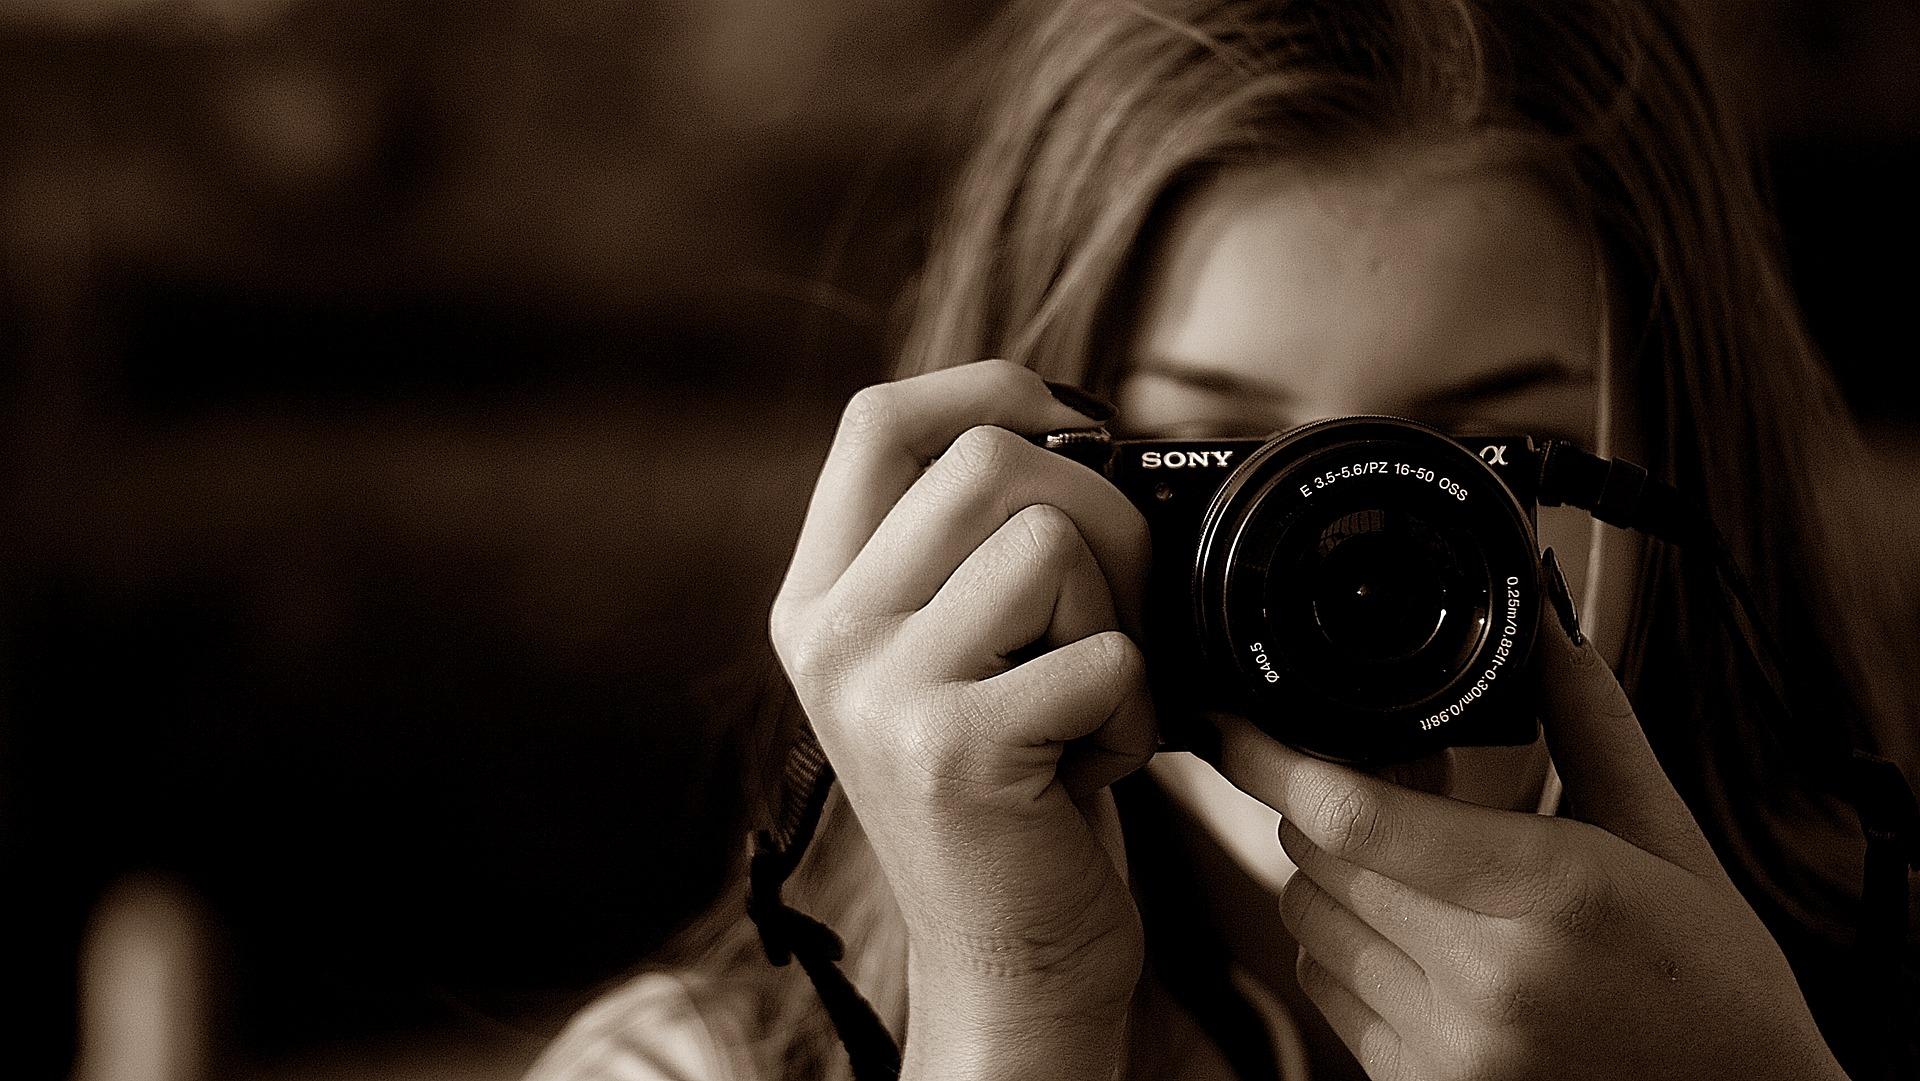 camera pd cc0 pixabay